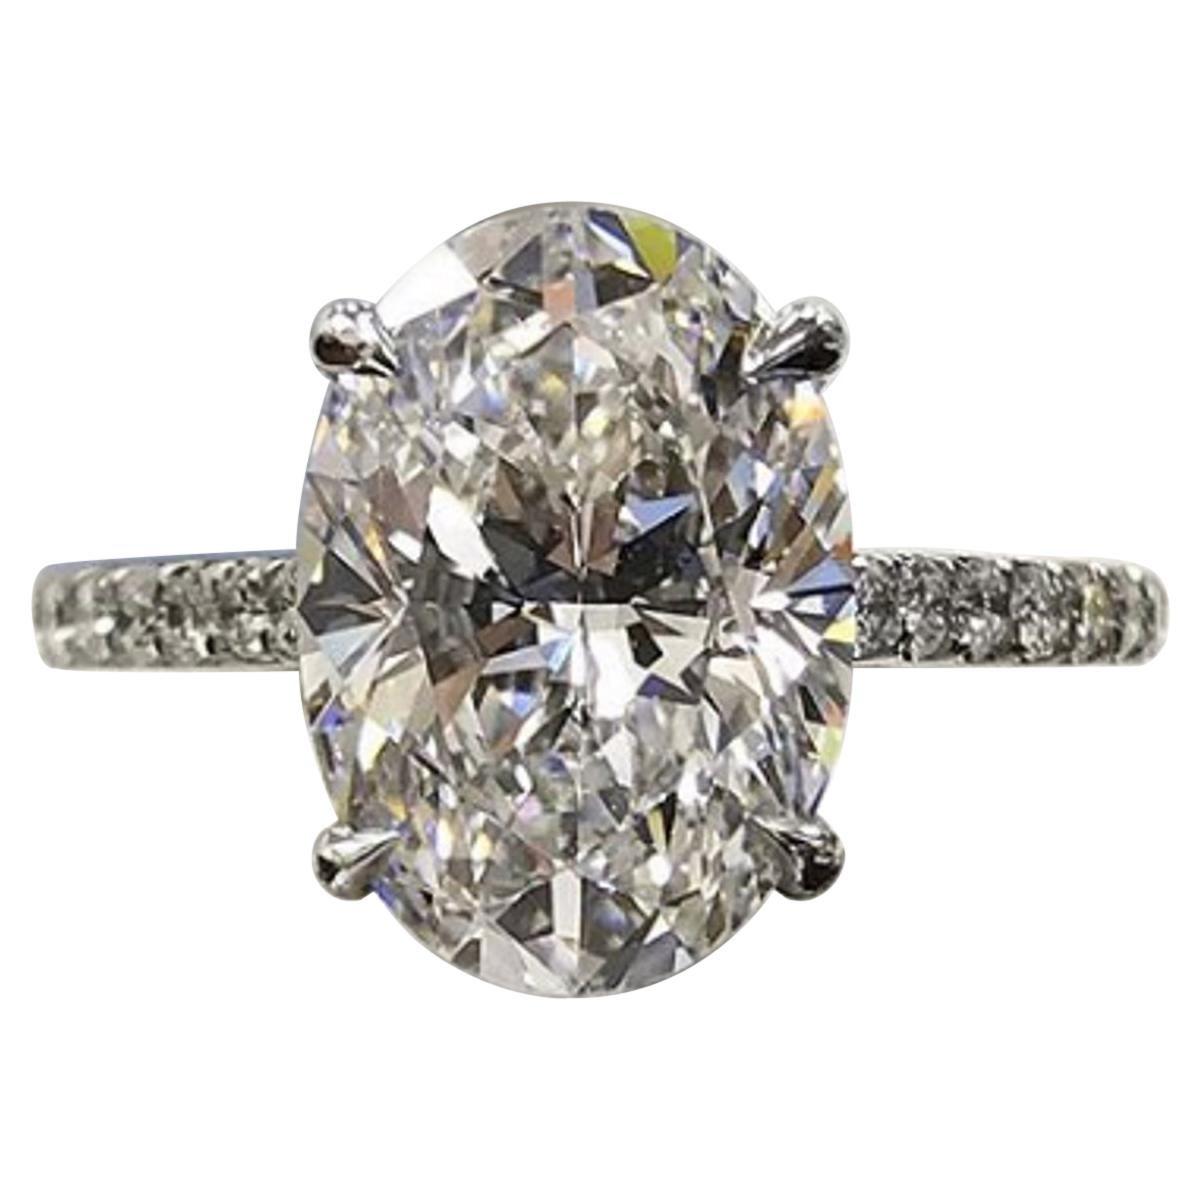 GIA Certified 2.30 Carat Oval Cut Diamond Eye Clean Engagement Ring